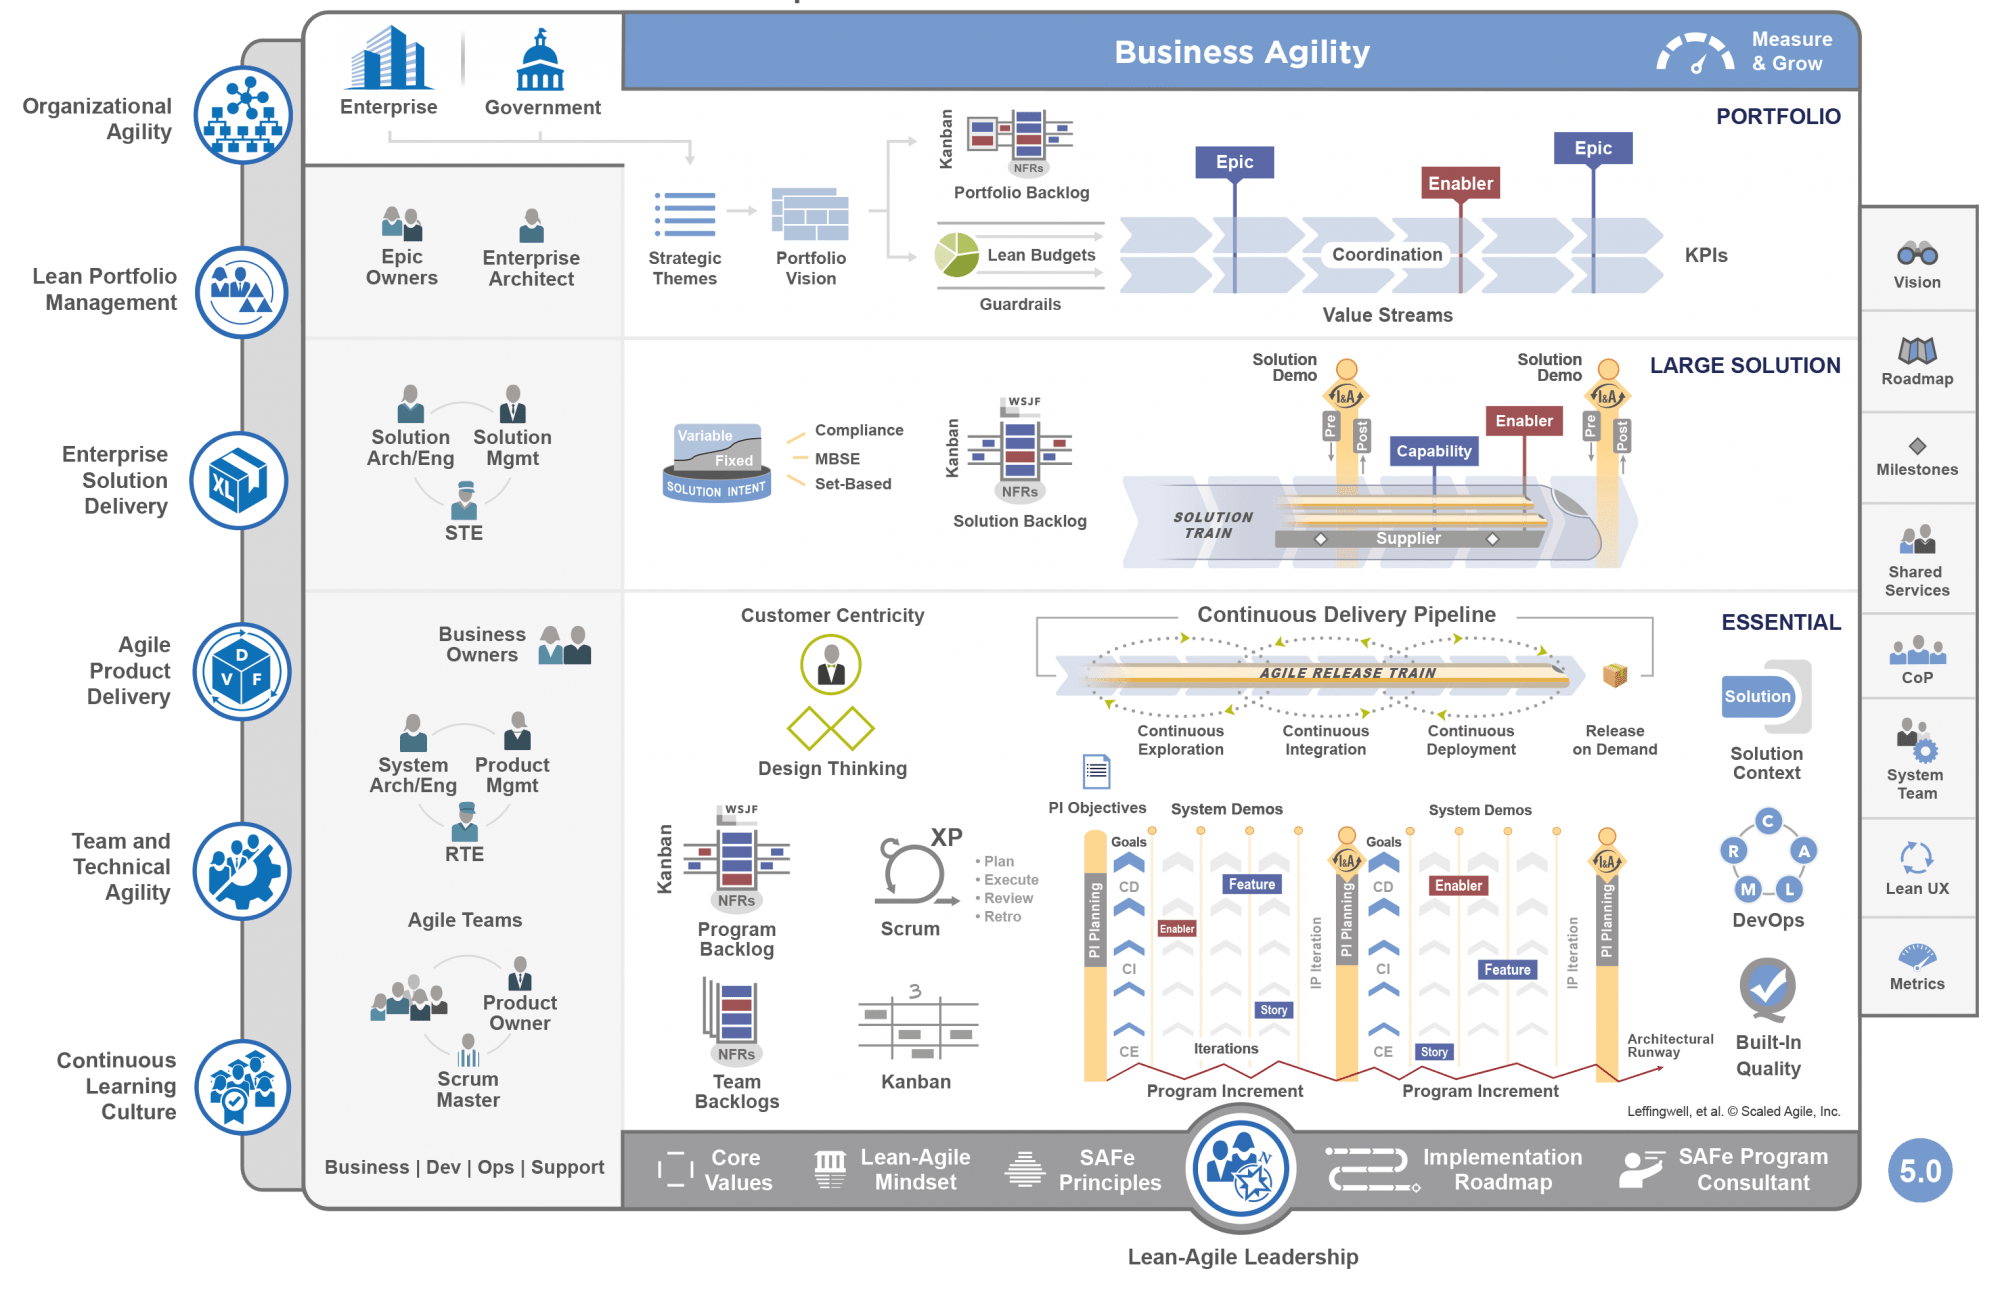 SAFe | Scaled Agile Framework